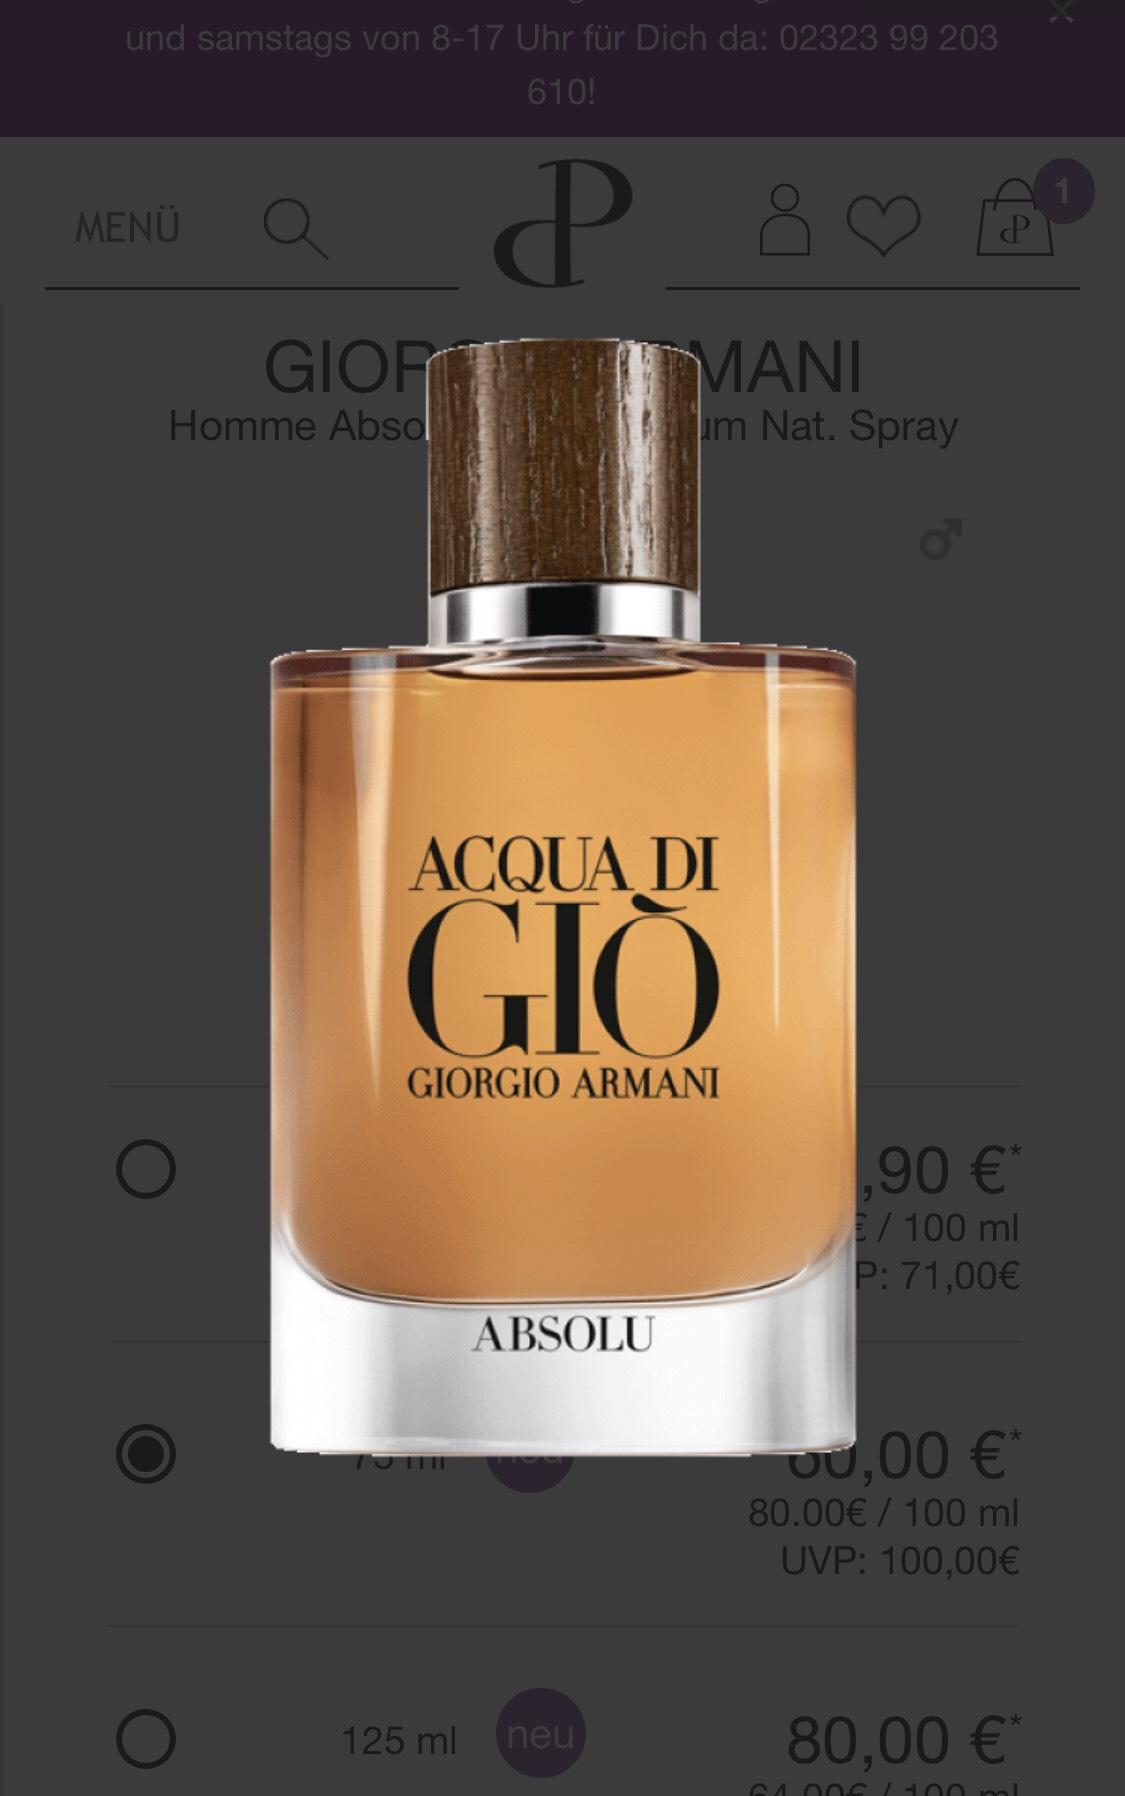 Parfum: Giorgio Armani - Aqua do Gio Absolu 75ml